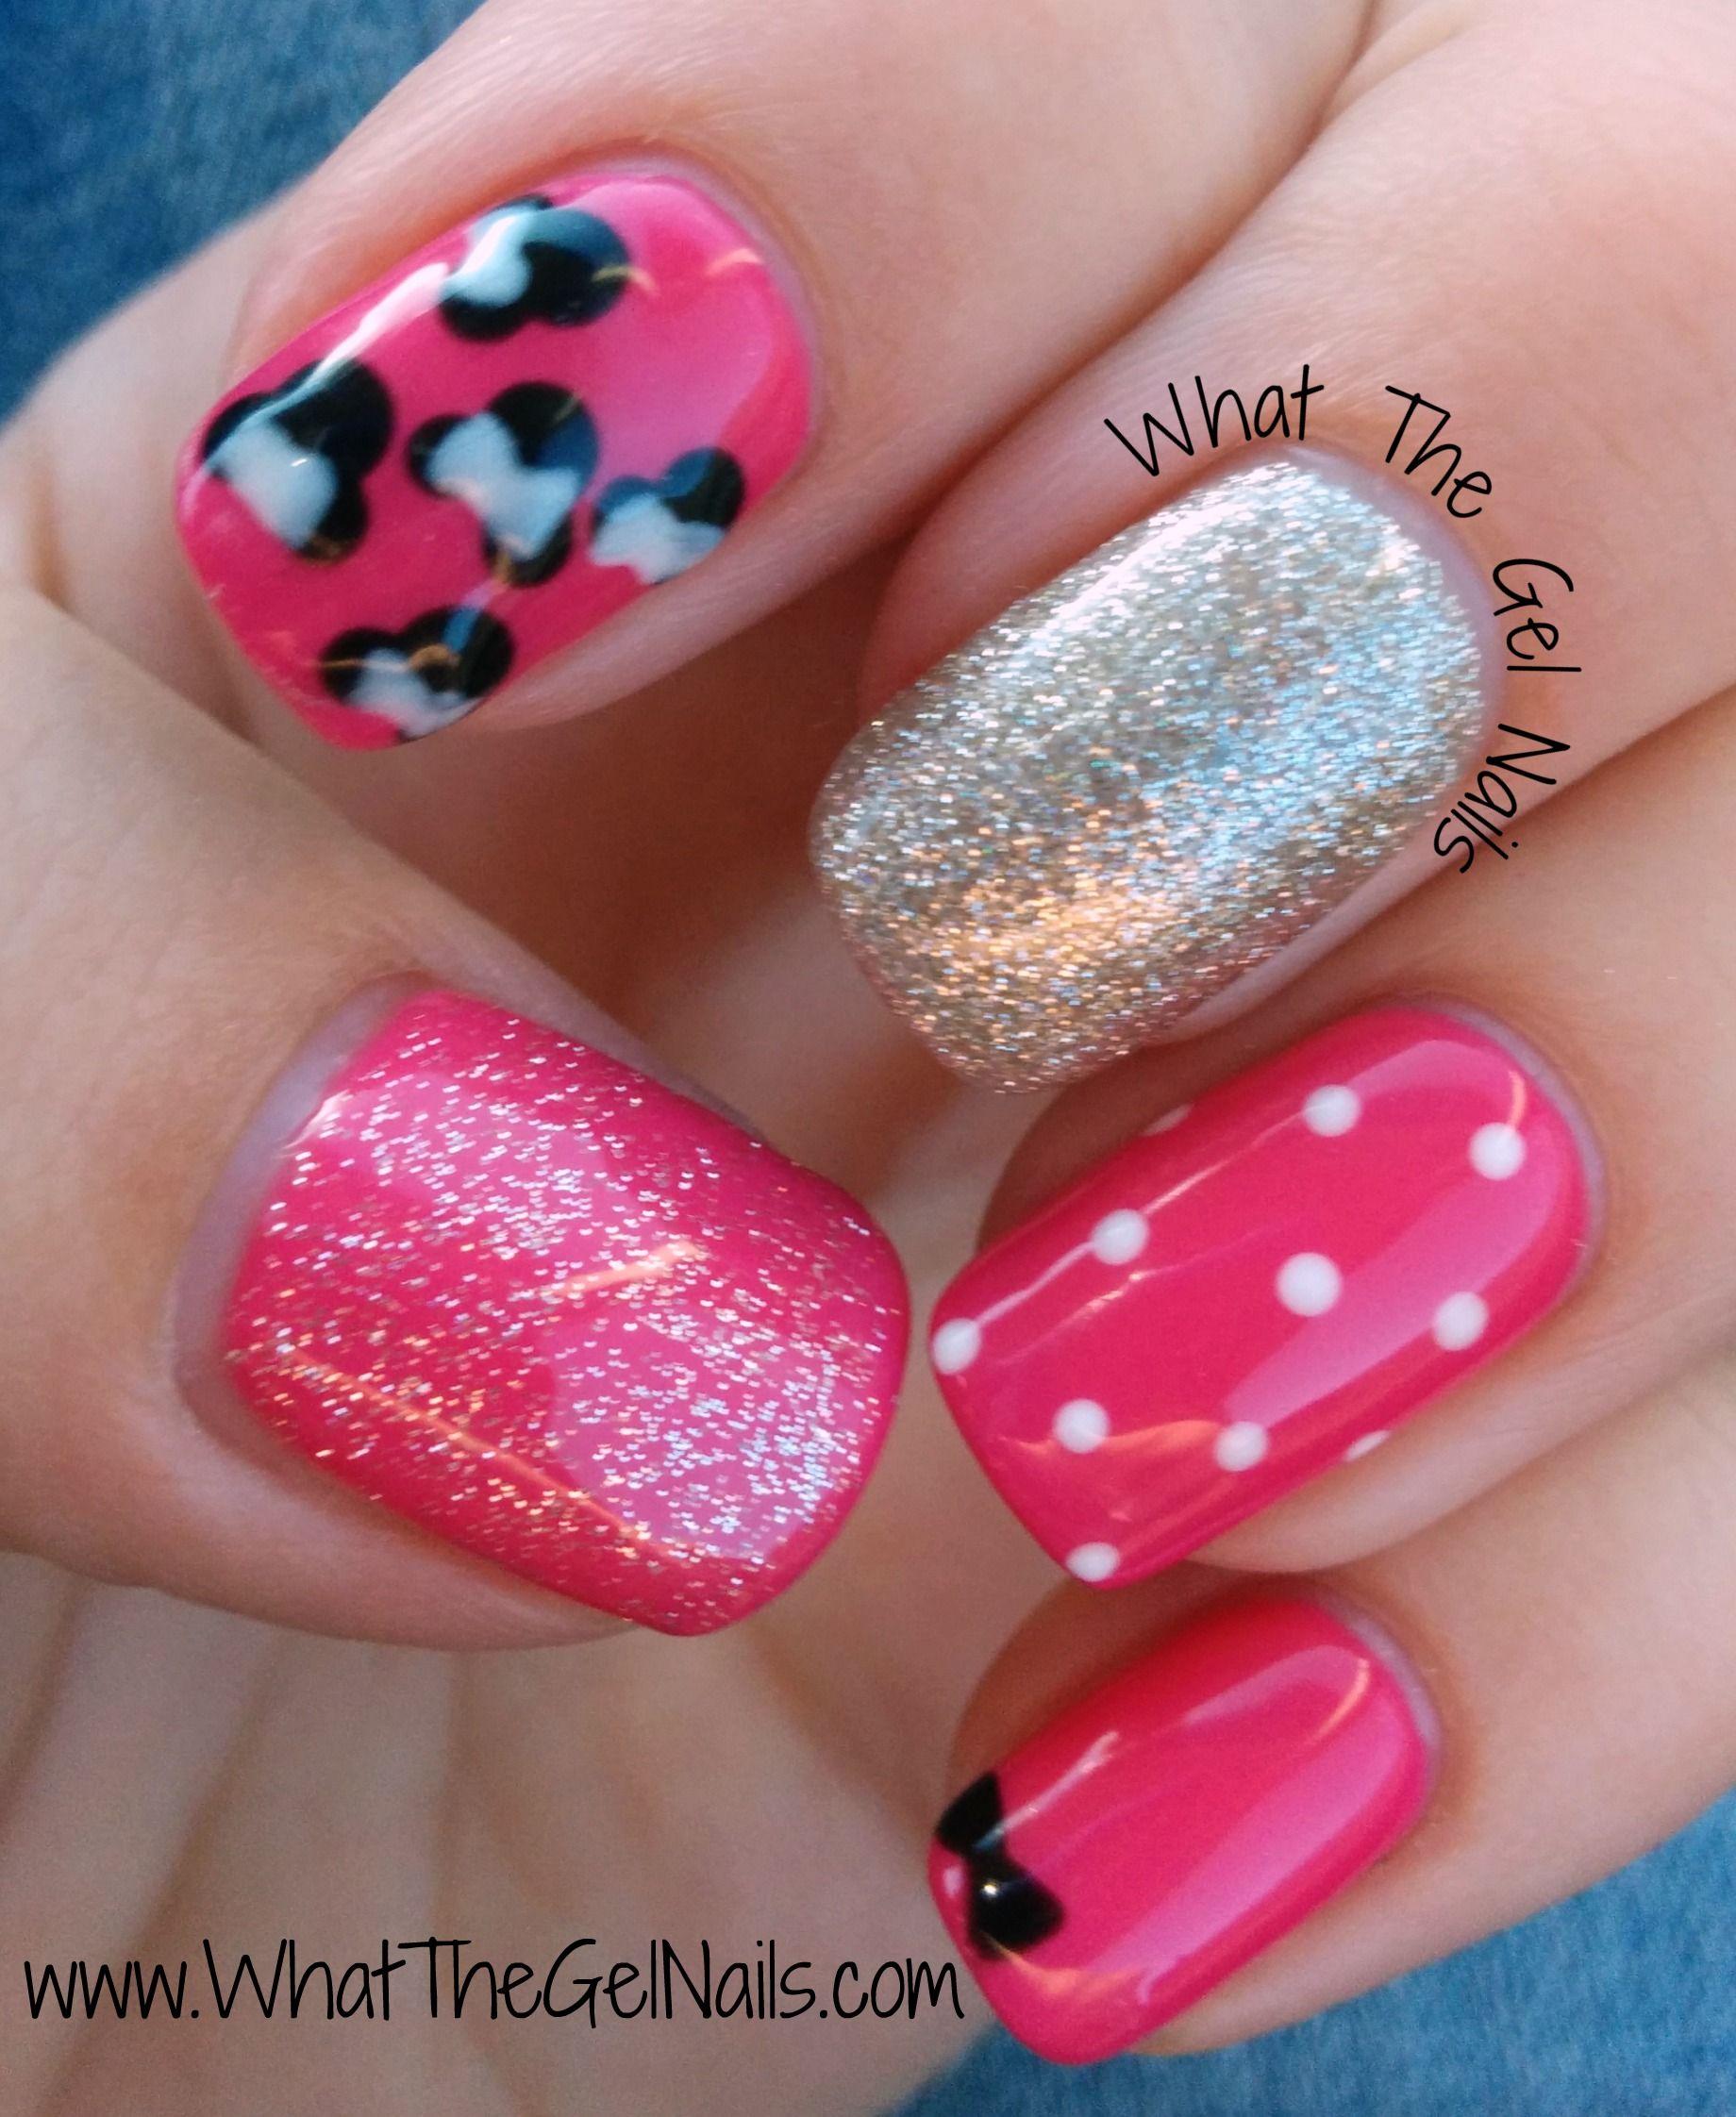 Disney Gel Polish Manicure - Nails   Pinterest